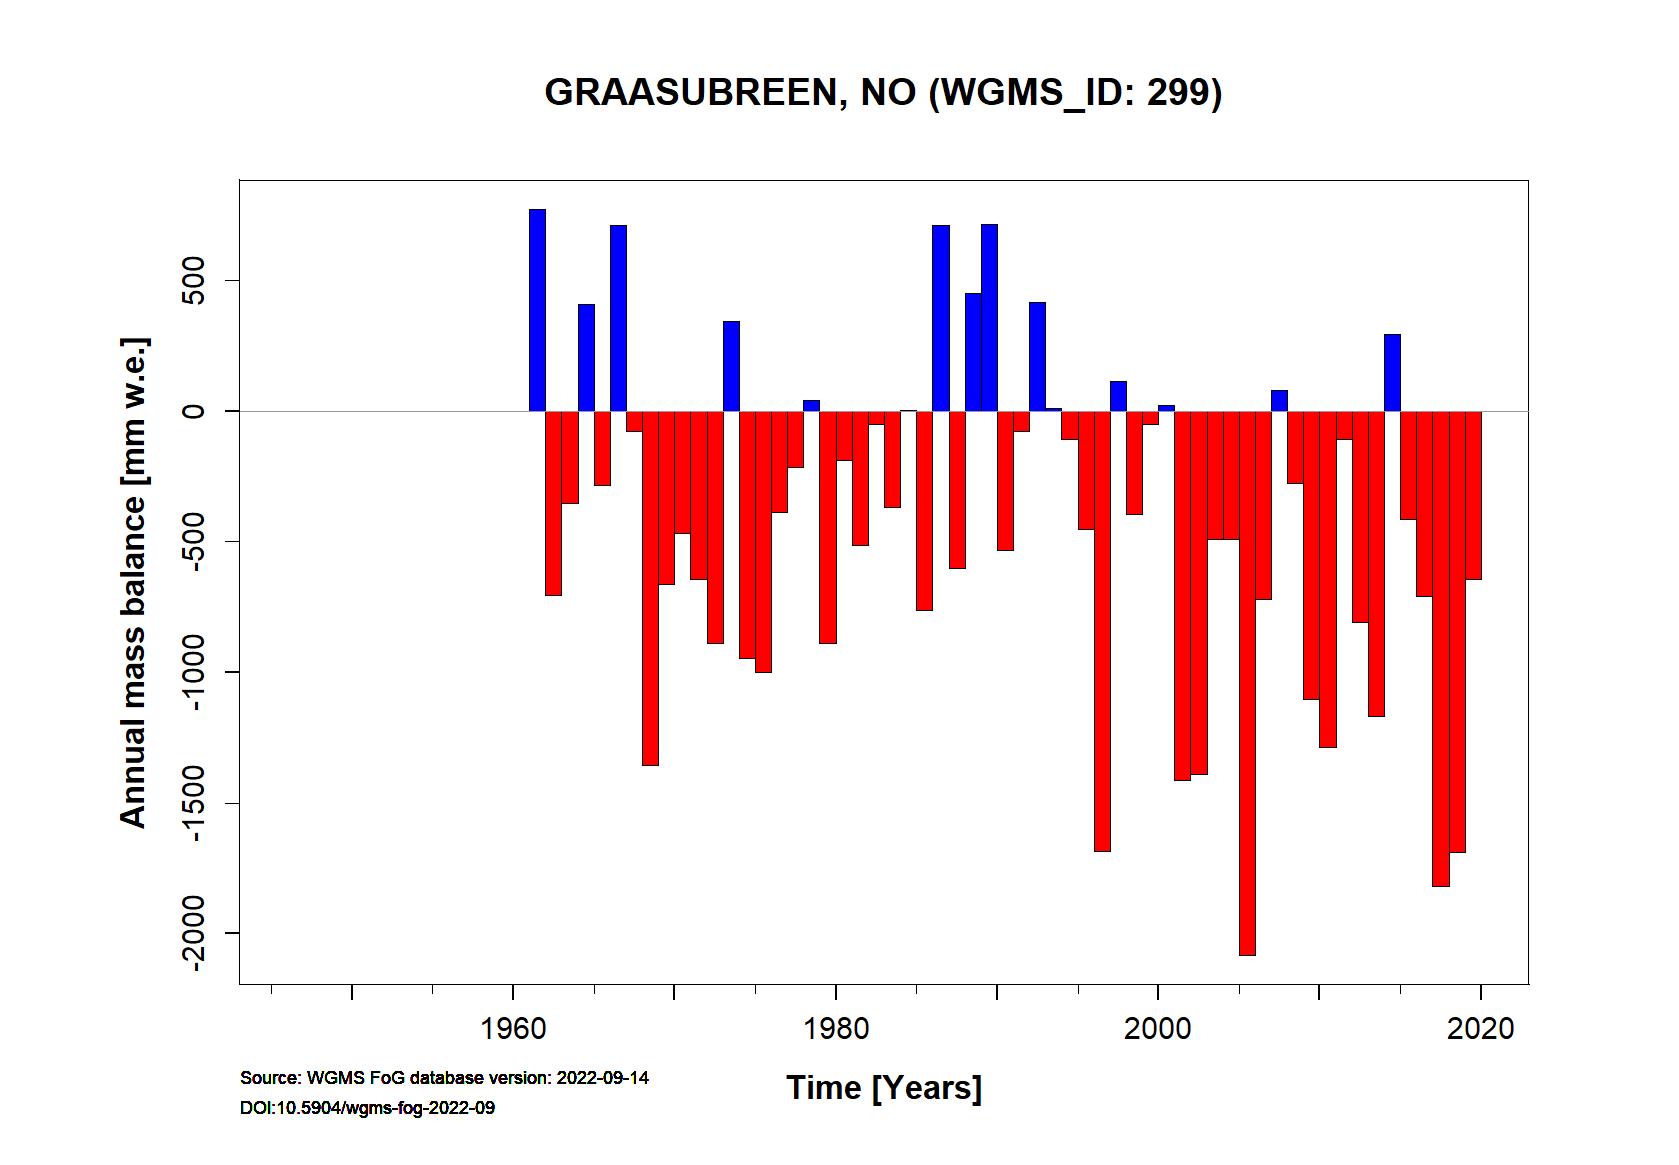 Graasubreen Annual Mass Balance (WGMS, 2016)